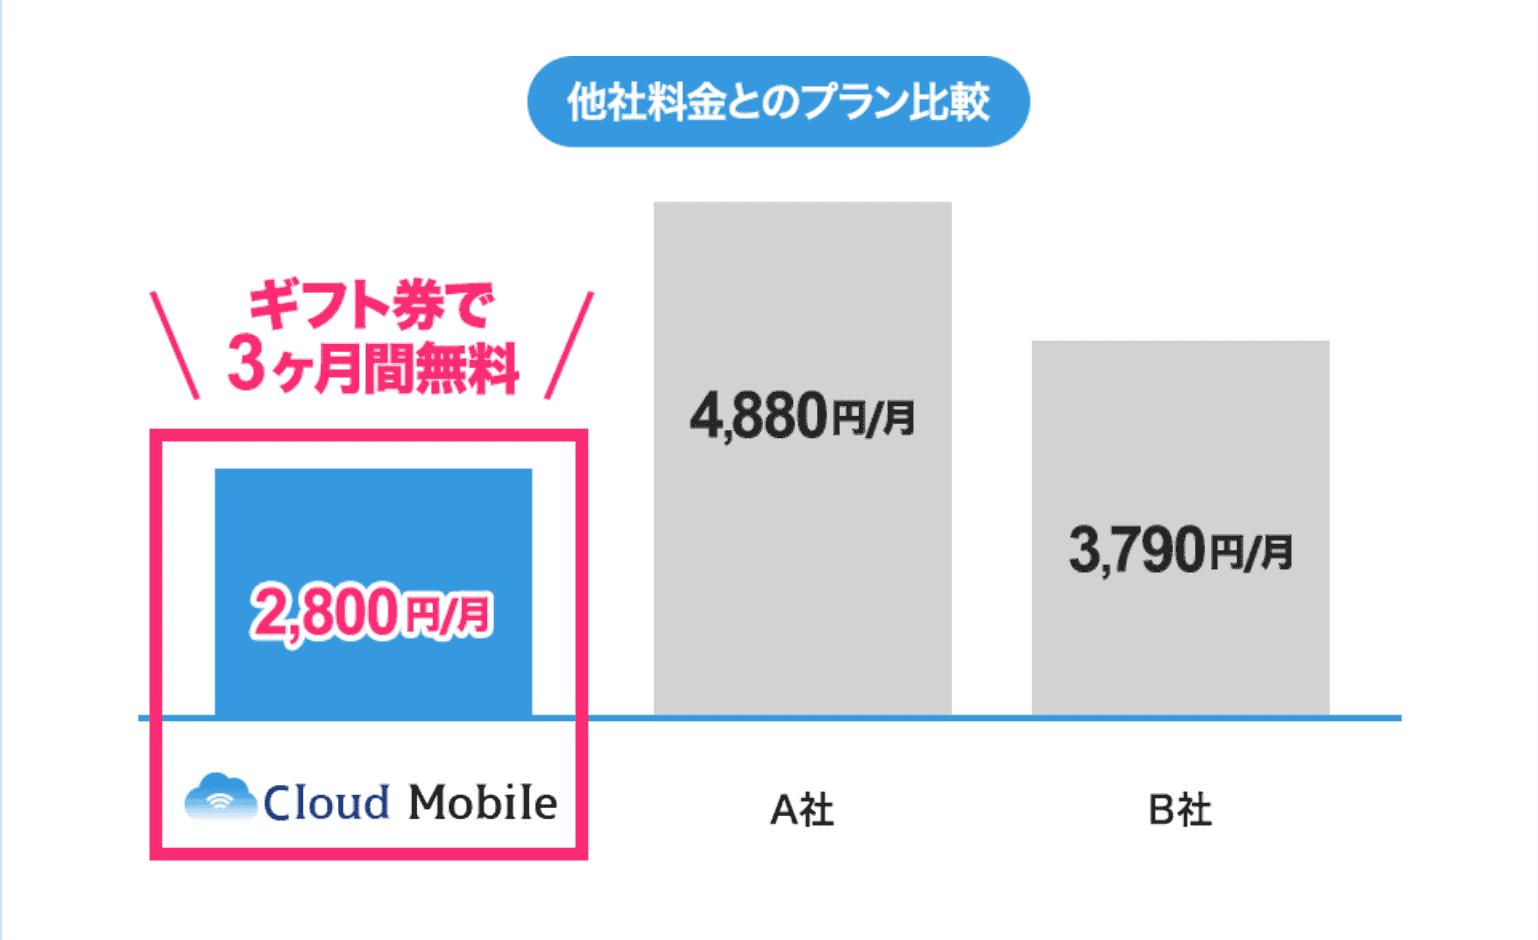 Cloud Mobileの料金比較